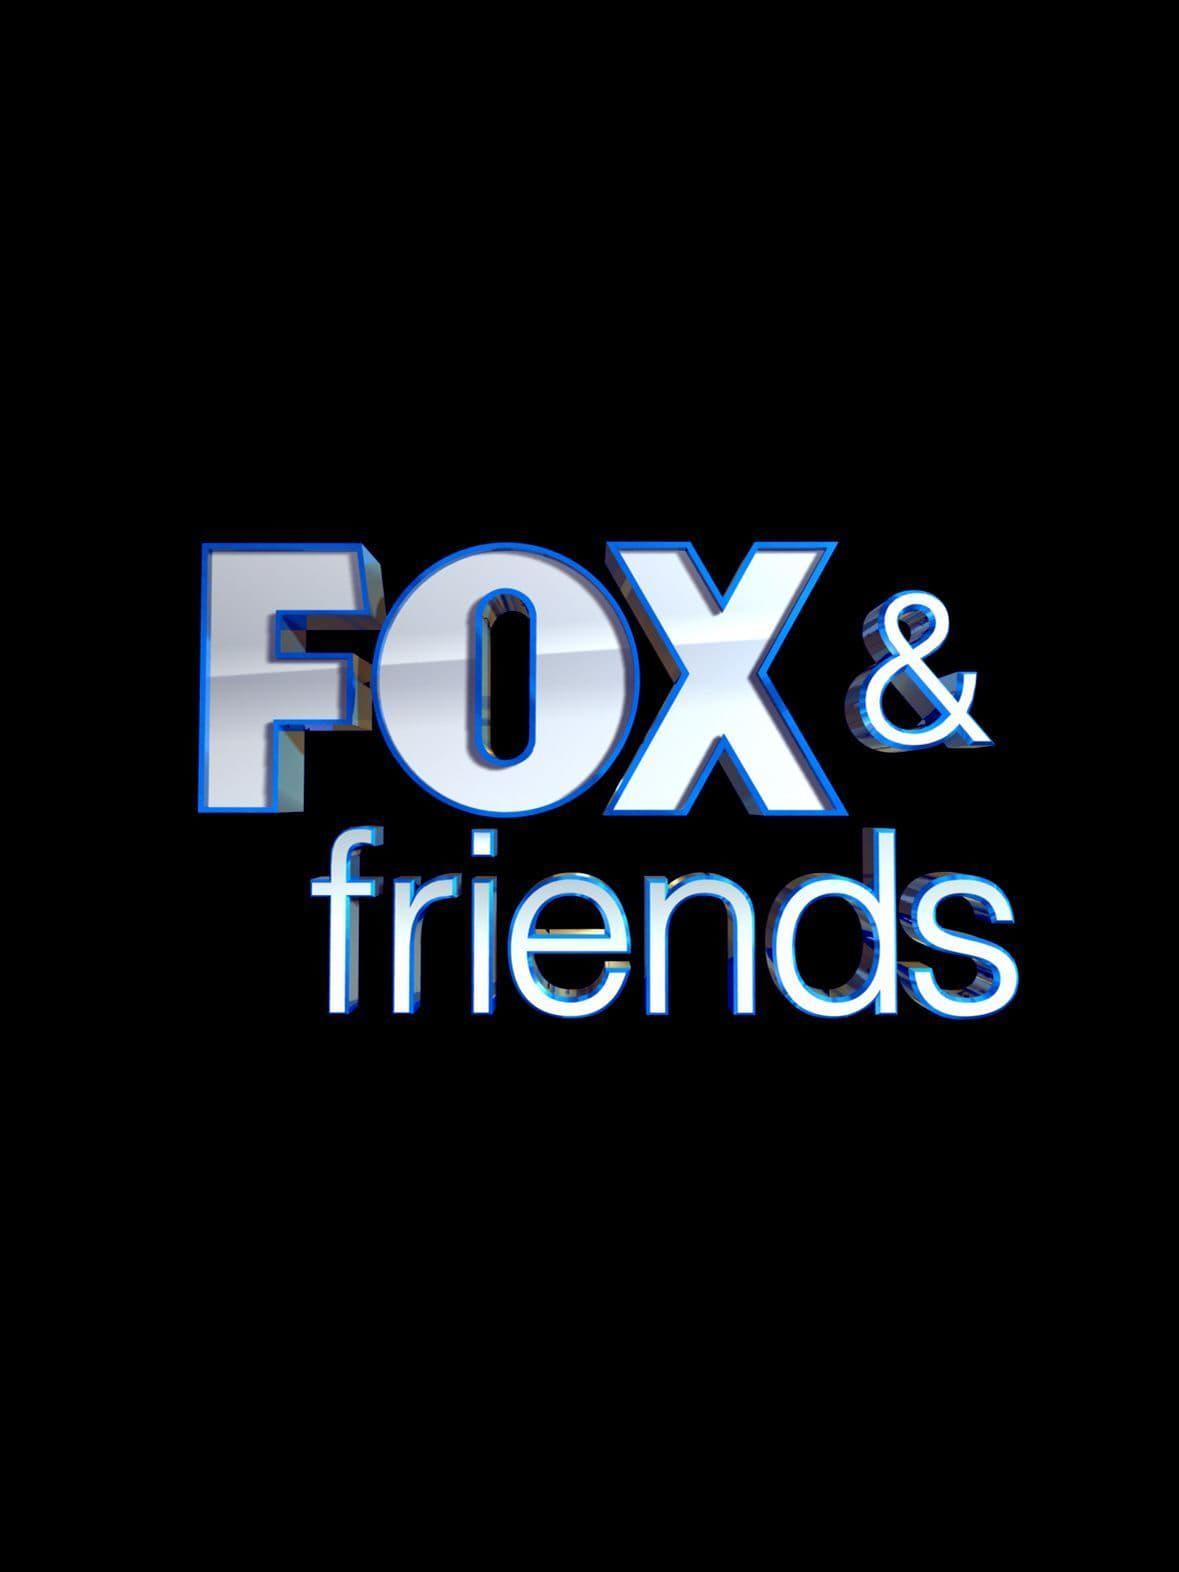 Fox & Friends